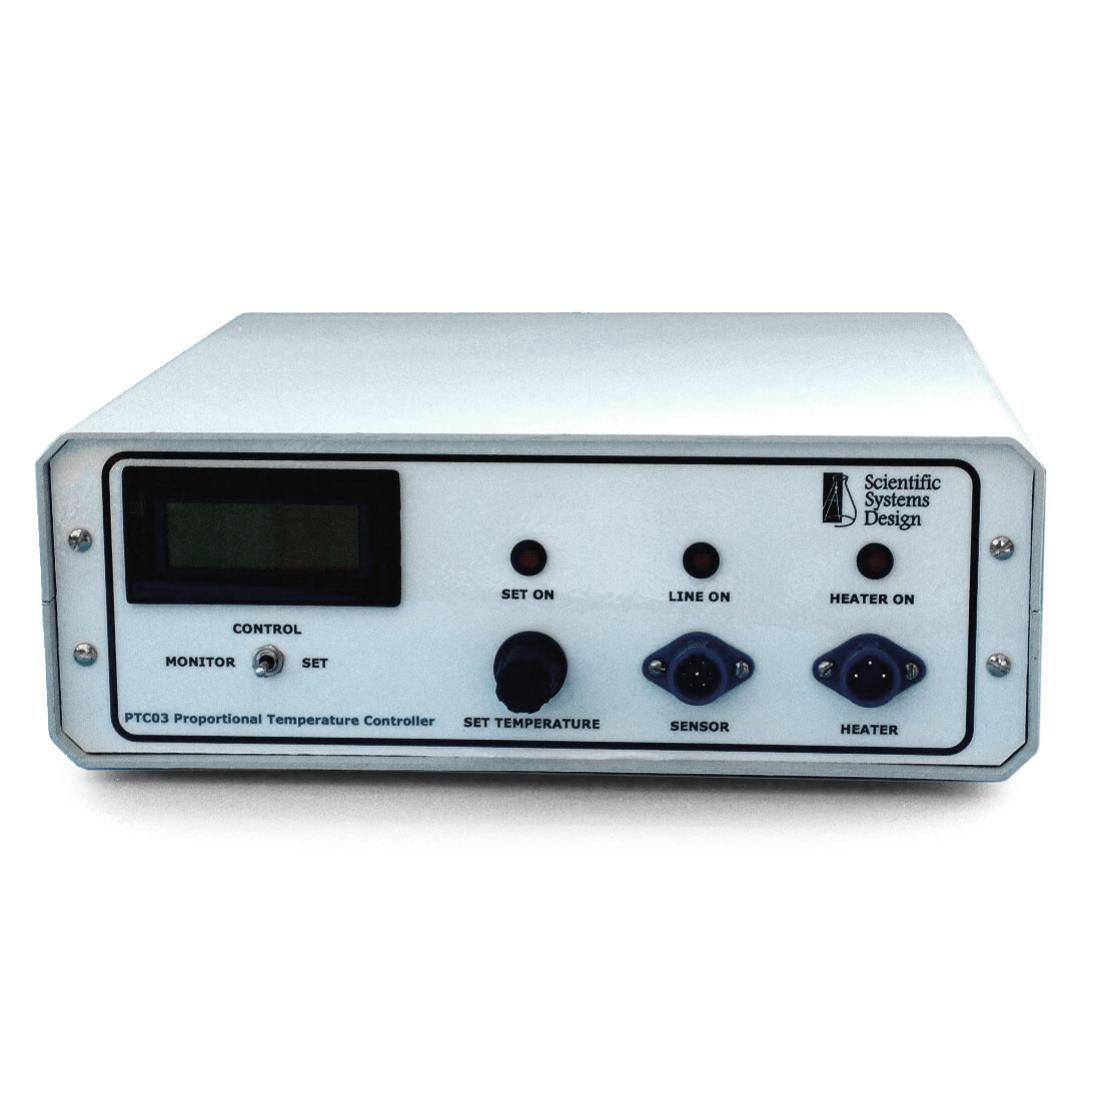 Proportional Temperature Controller - PTC03